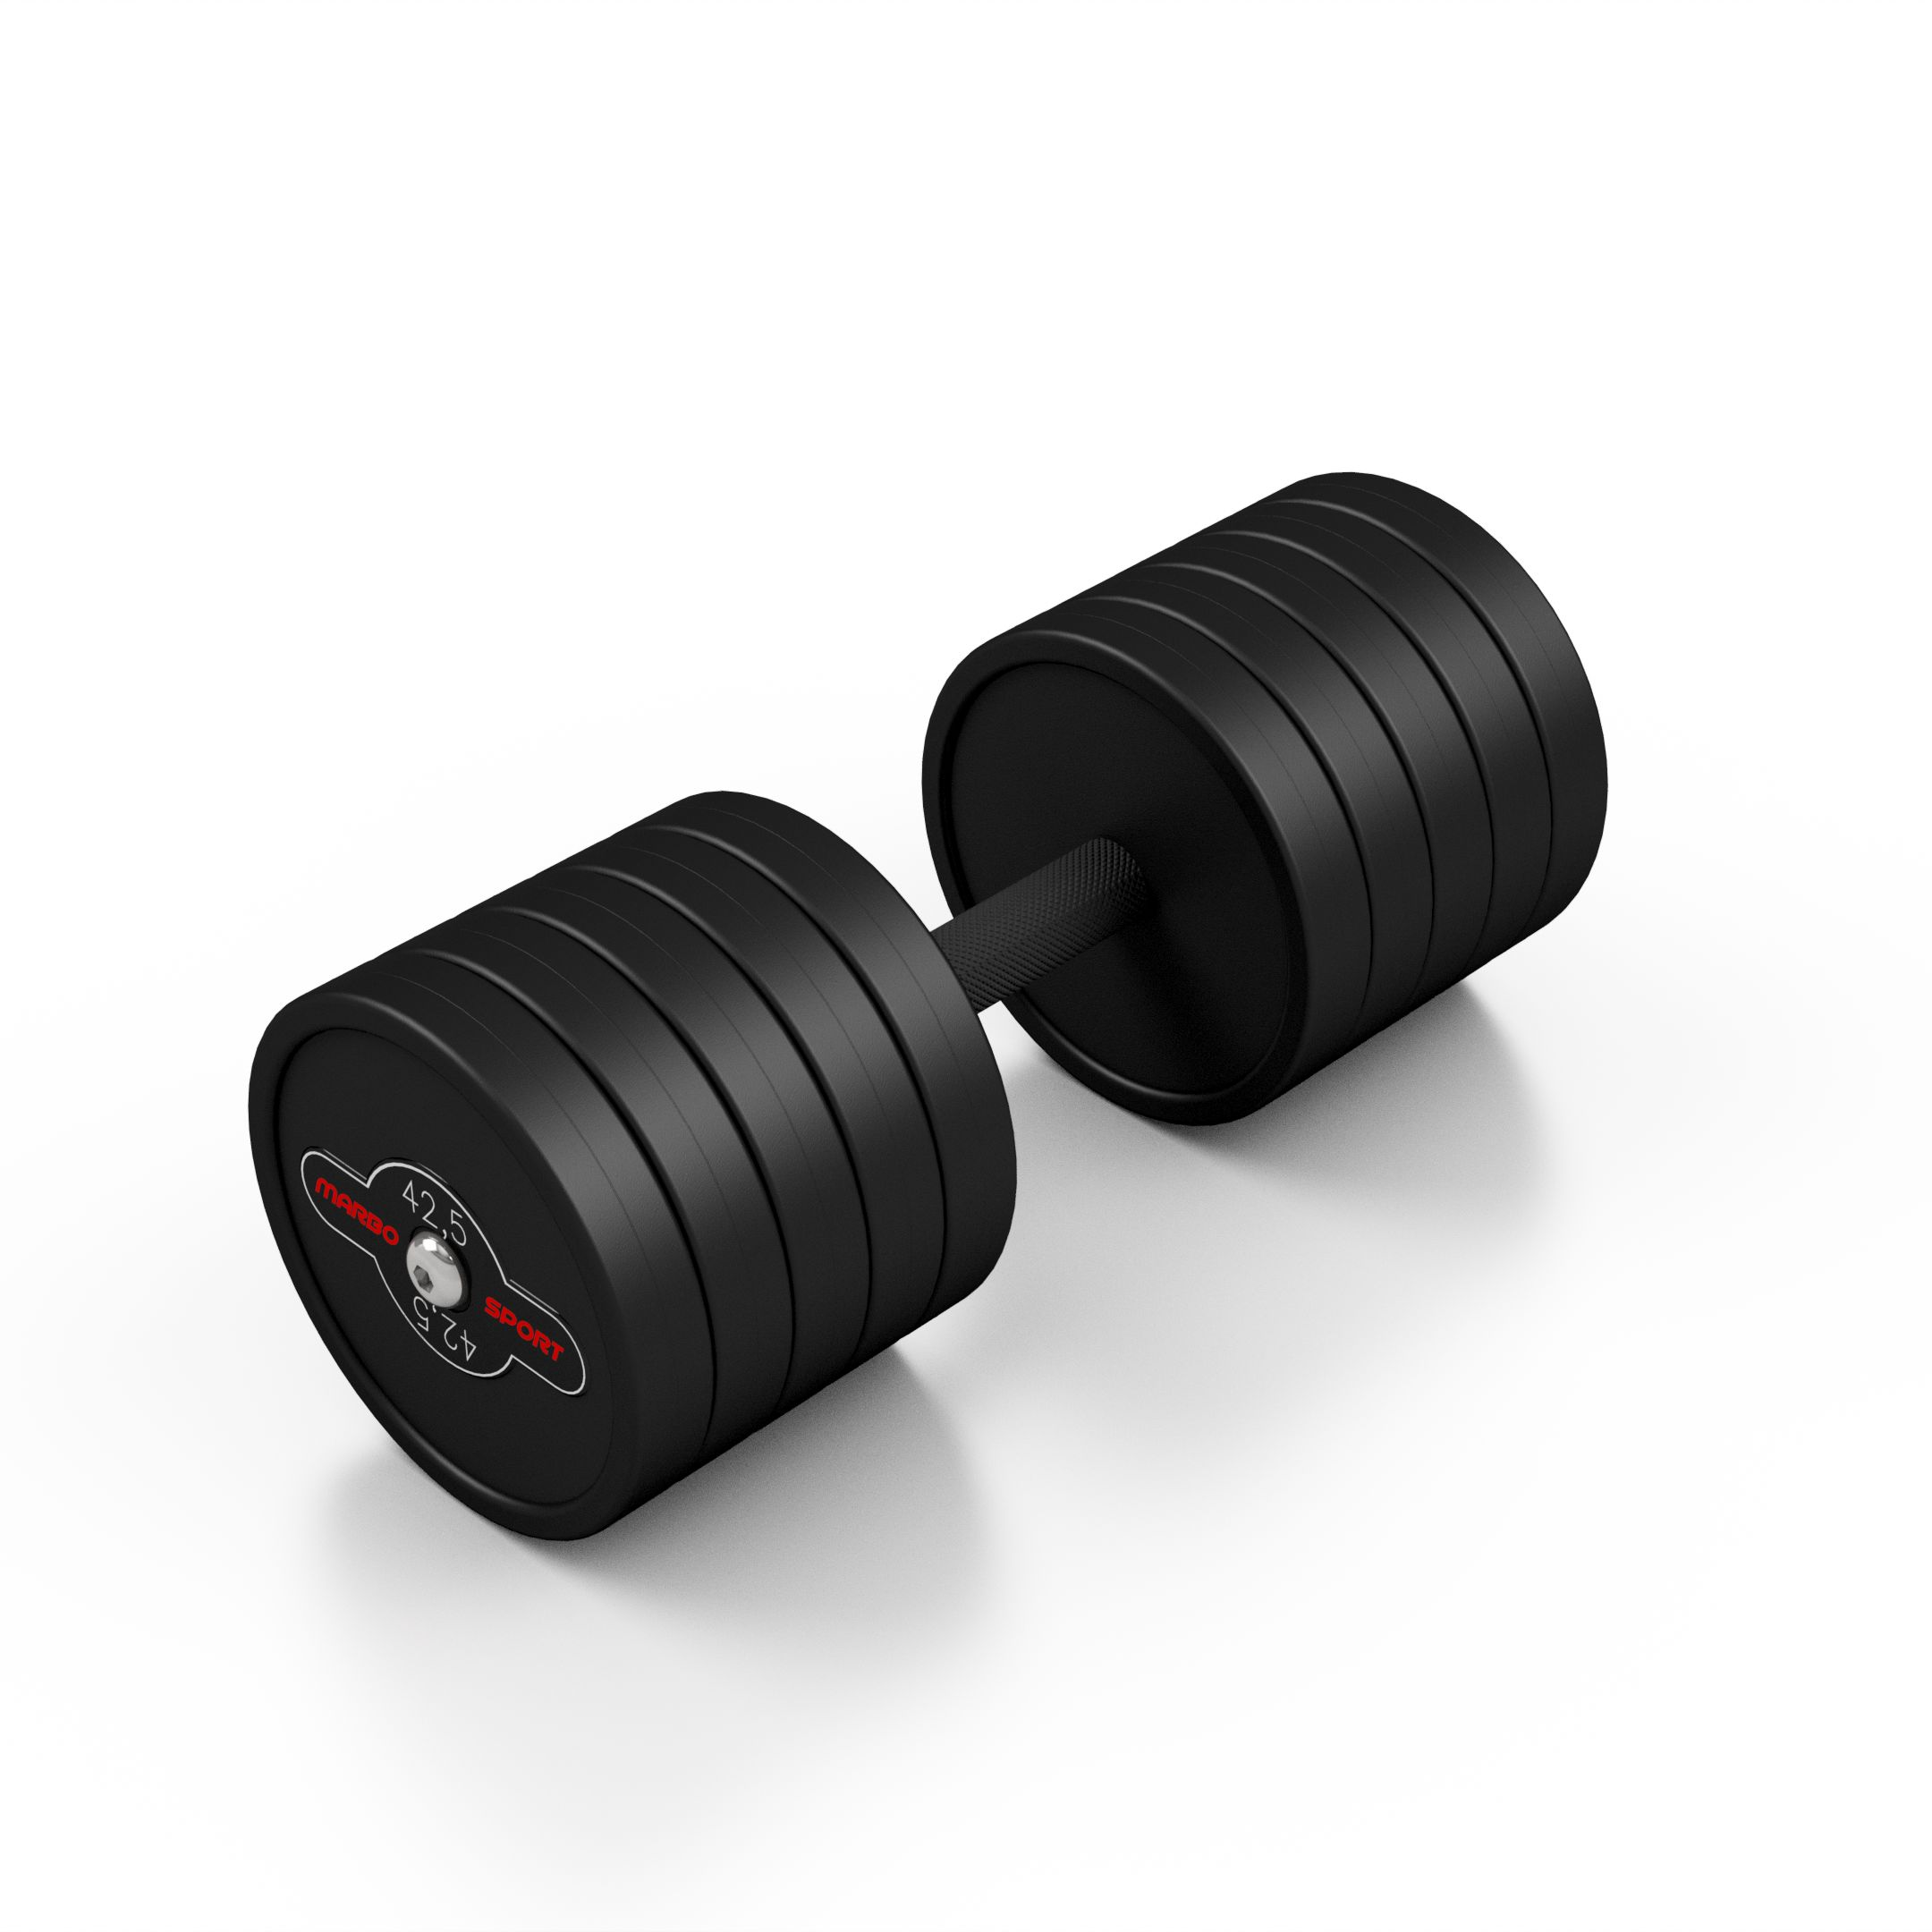 Hantla stalowa gumowana 42,5 kg czarny mat - Marbo Sport - 42,5 kg